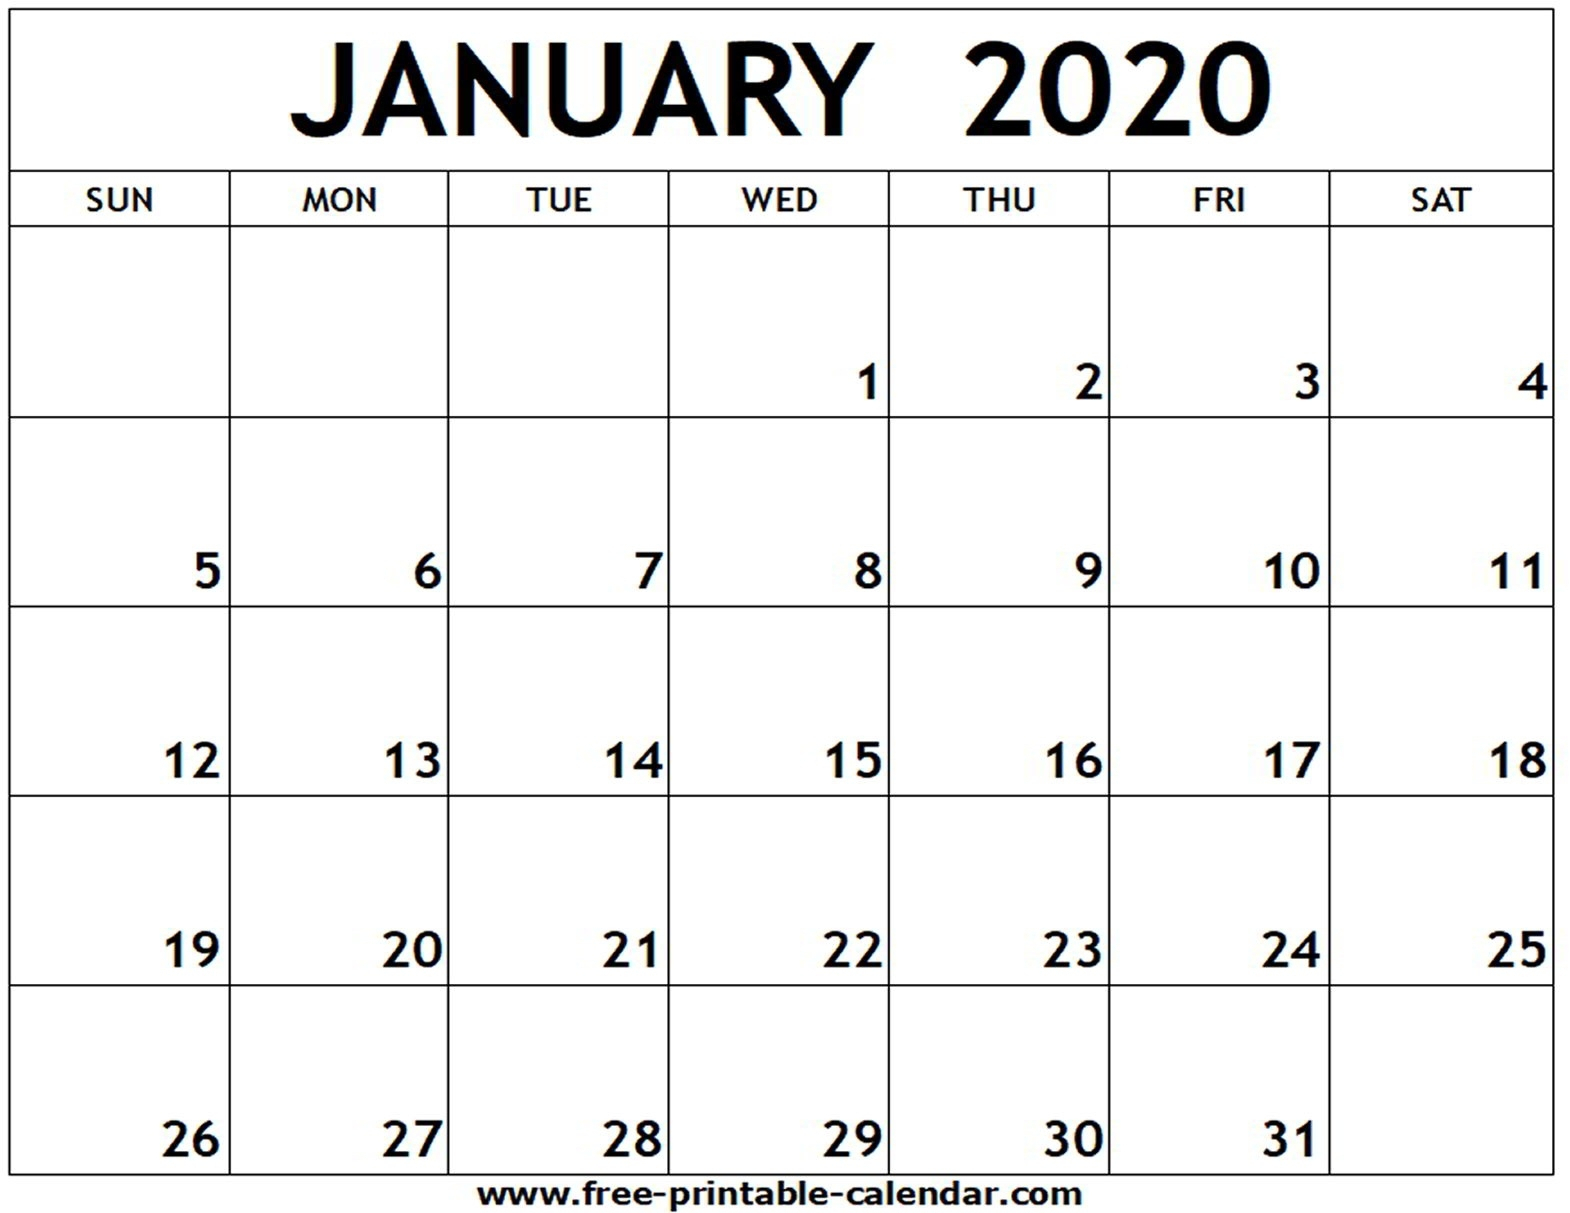 January 2020 Printable Calendar – Free-Printable-Calendar